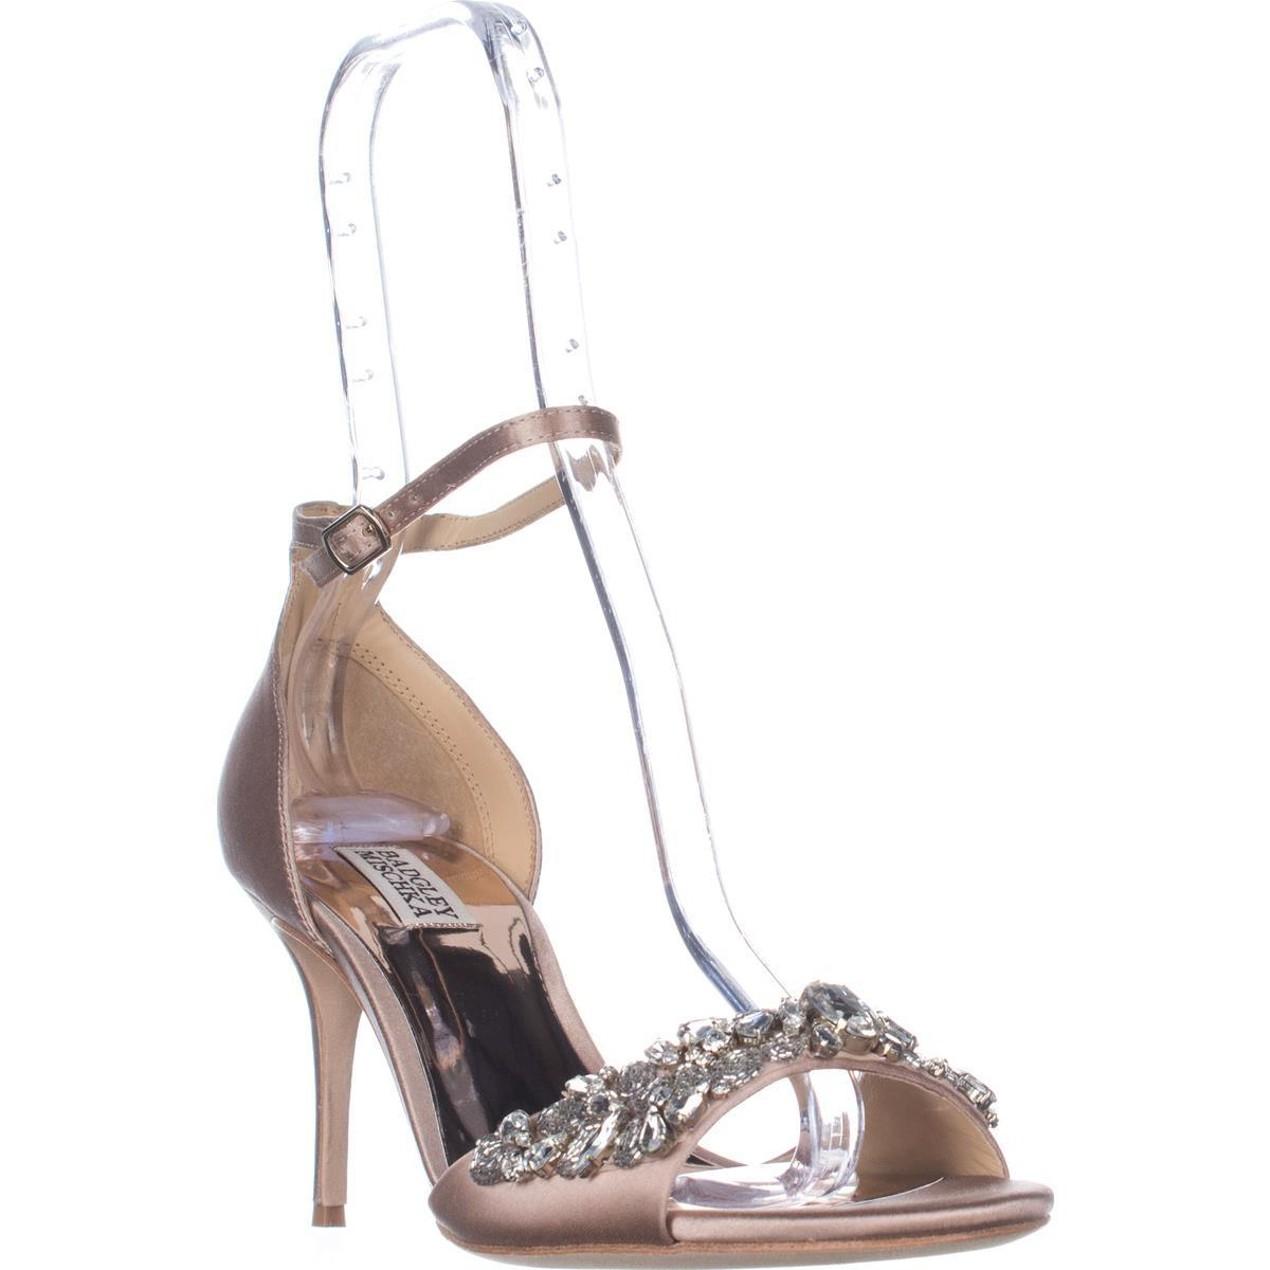 b6c33648b8e Badgley Mischka Bankston Ankle-Strap Dress Sandals